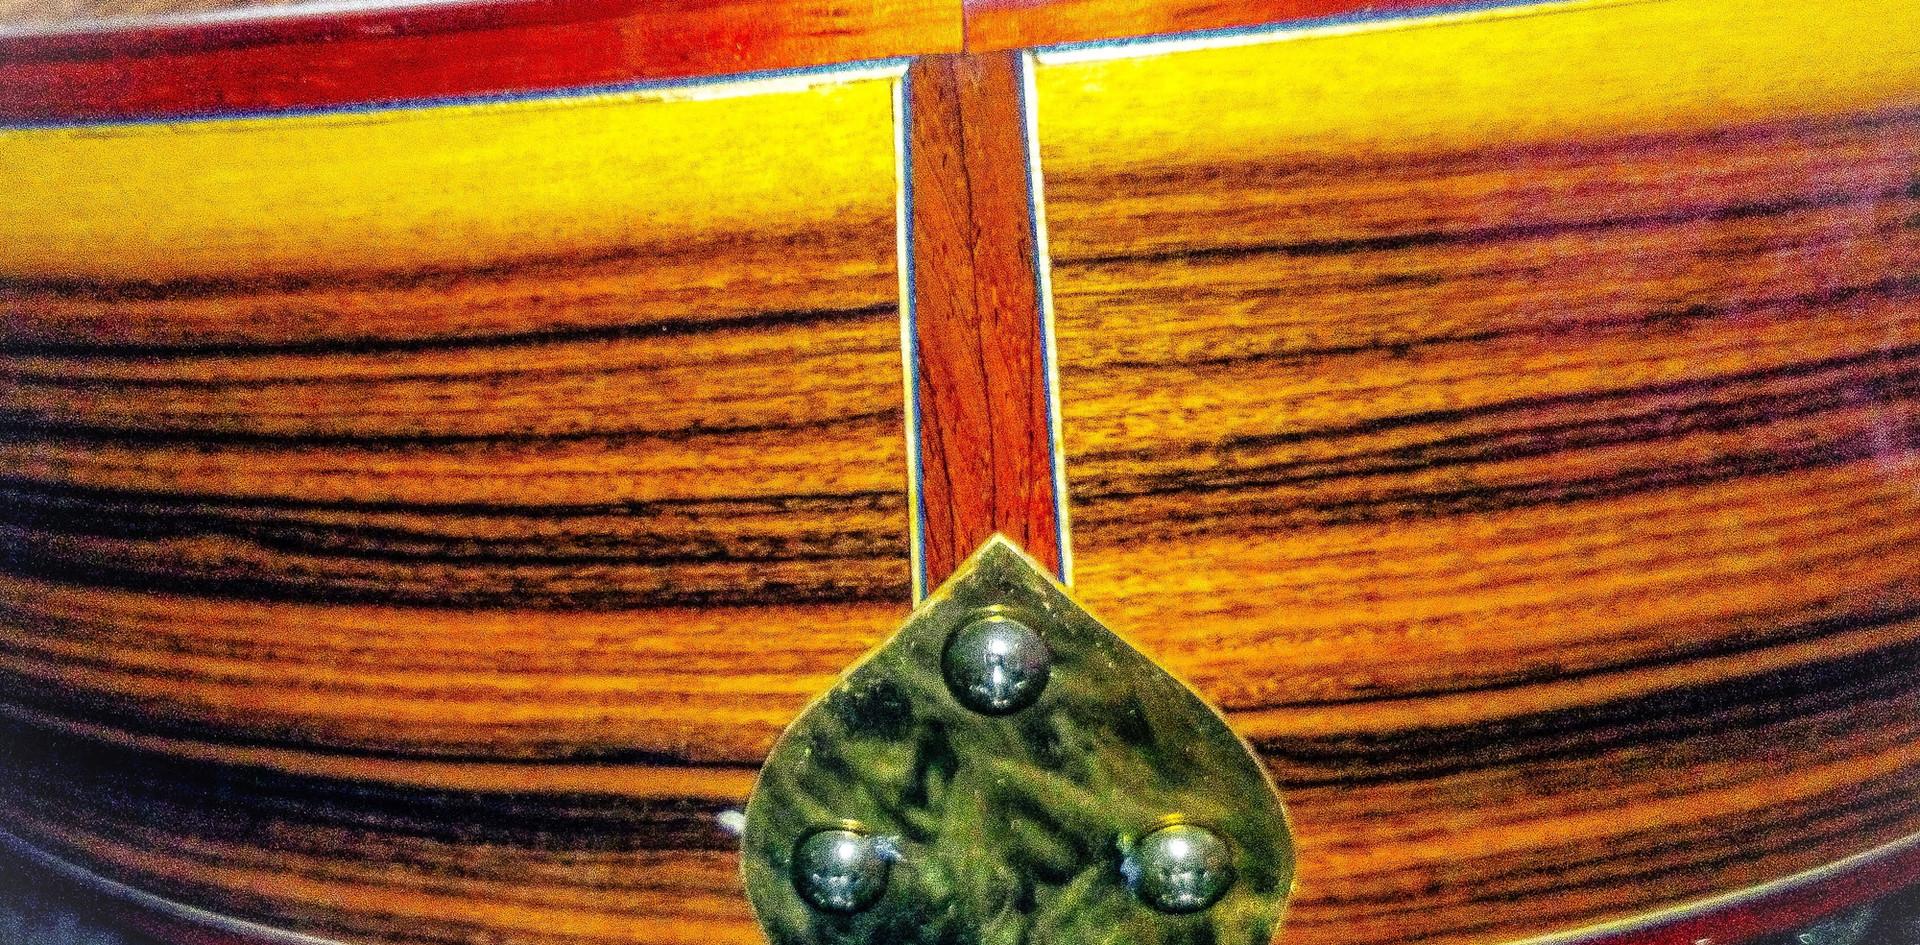 Irish Handmade Octave MandolinIrish Handmade Octave Mandolin